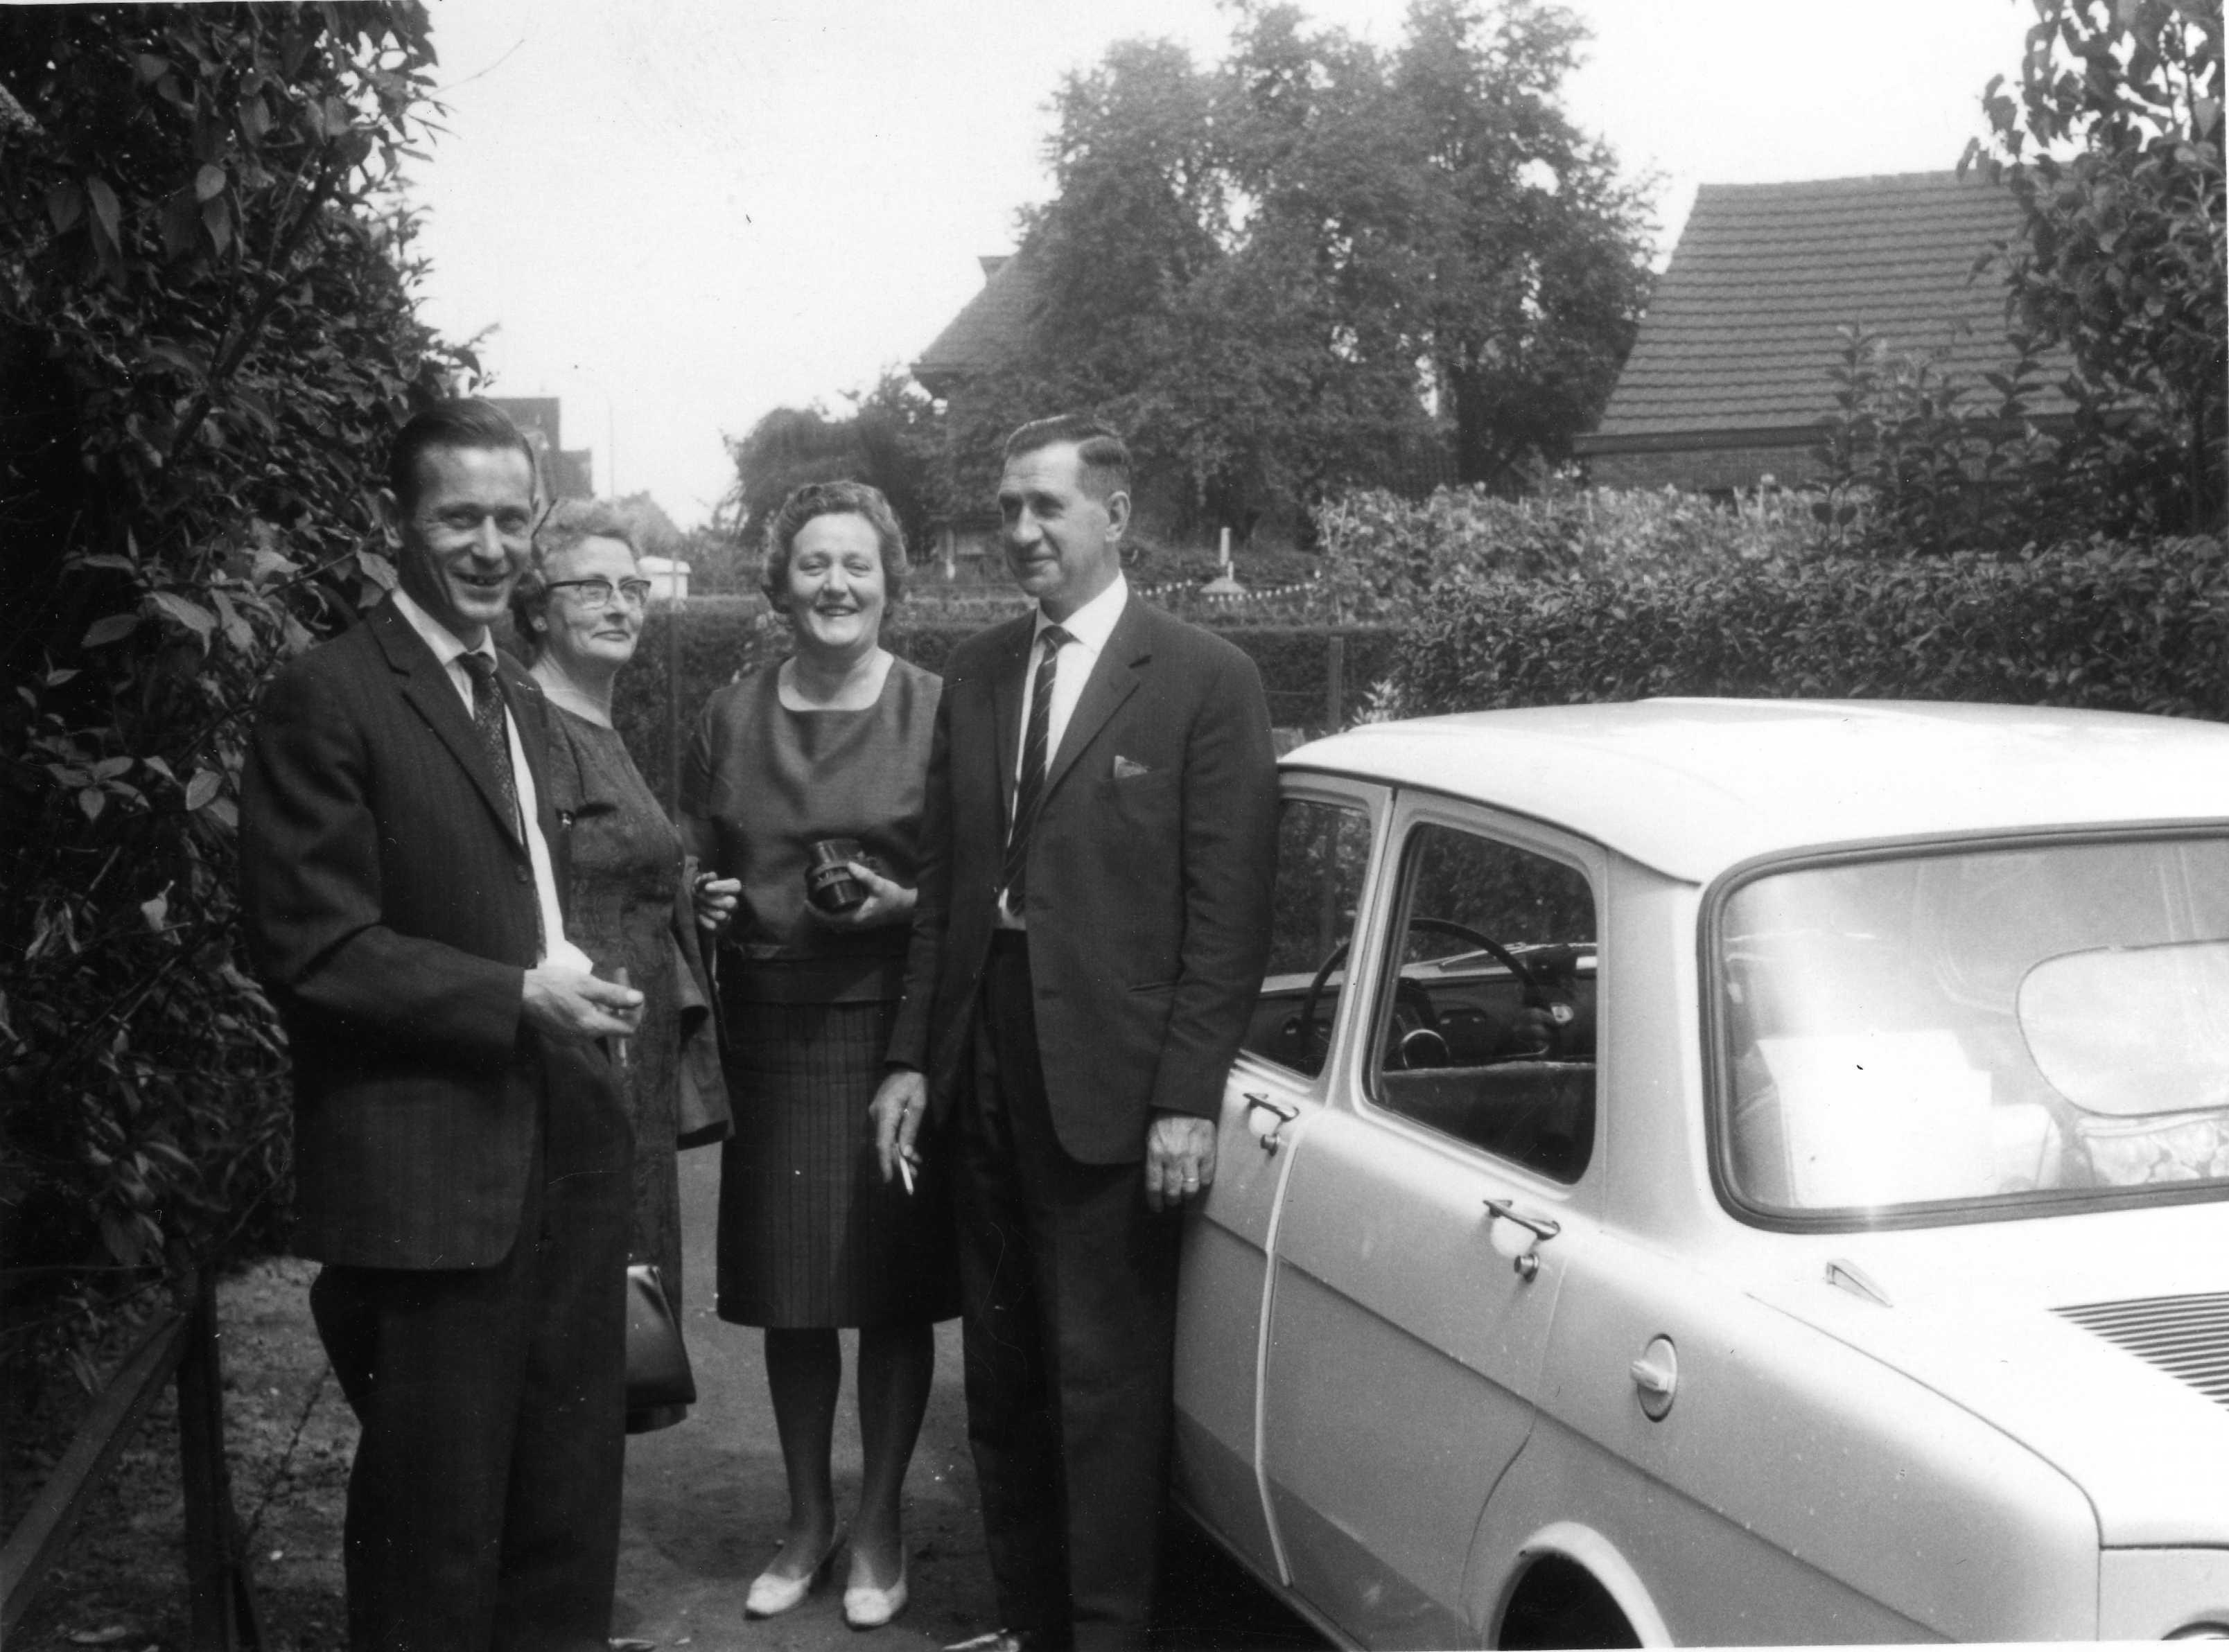 Marinus Gerardus van Walstijn (1911-1978), Johanna Maria Brouwer (1906-1992), Maria Johanna Agterberg (1912-1990), Pieter Brouwer (1912-2005)